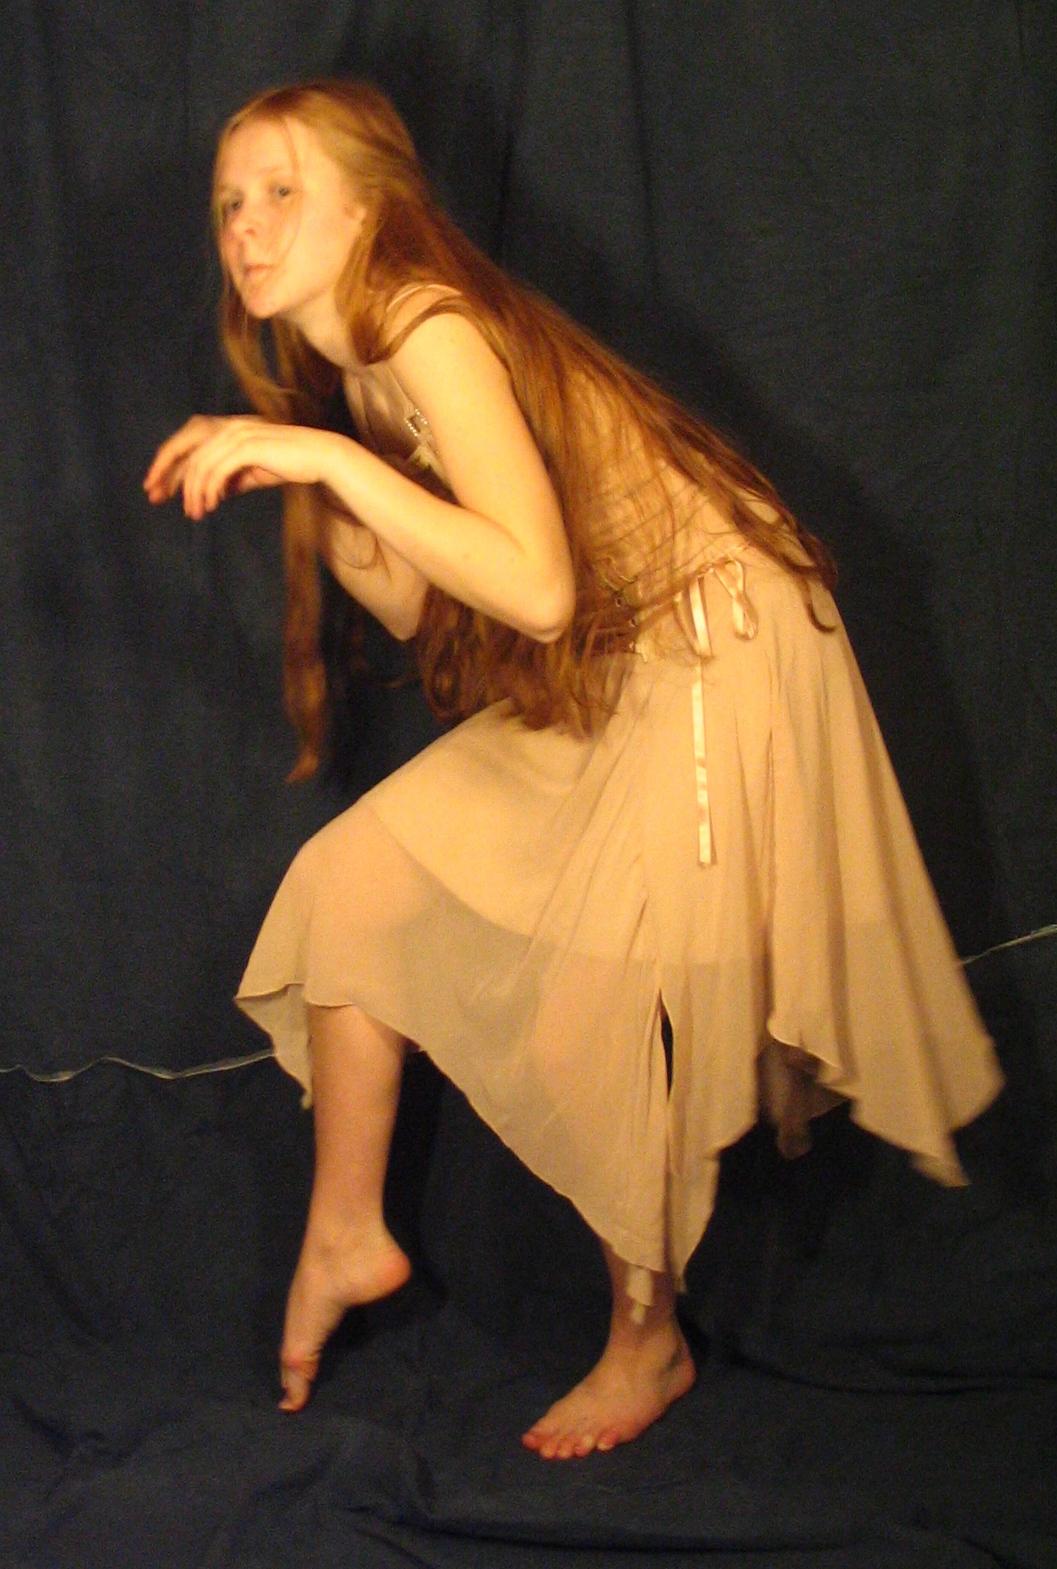 Fairy 58 by Iardacil-stock